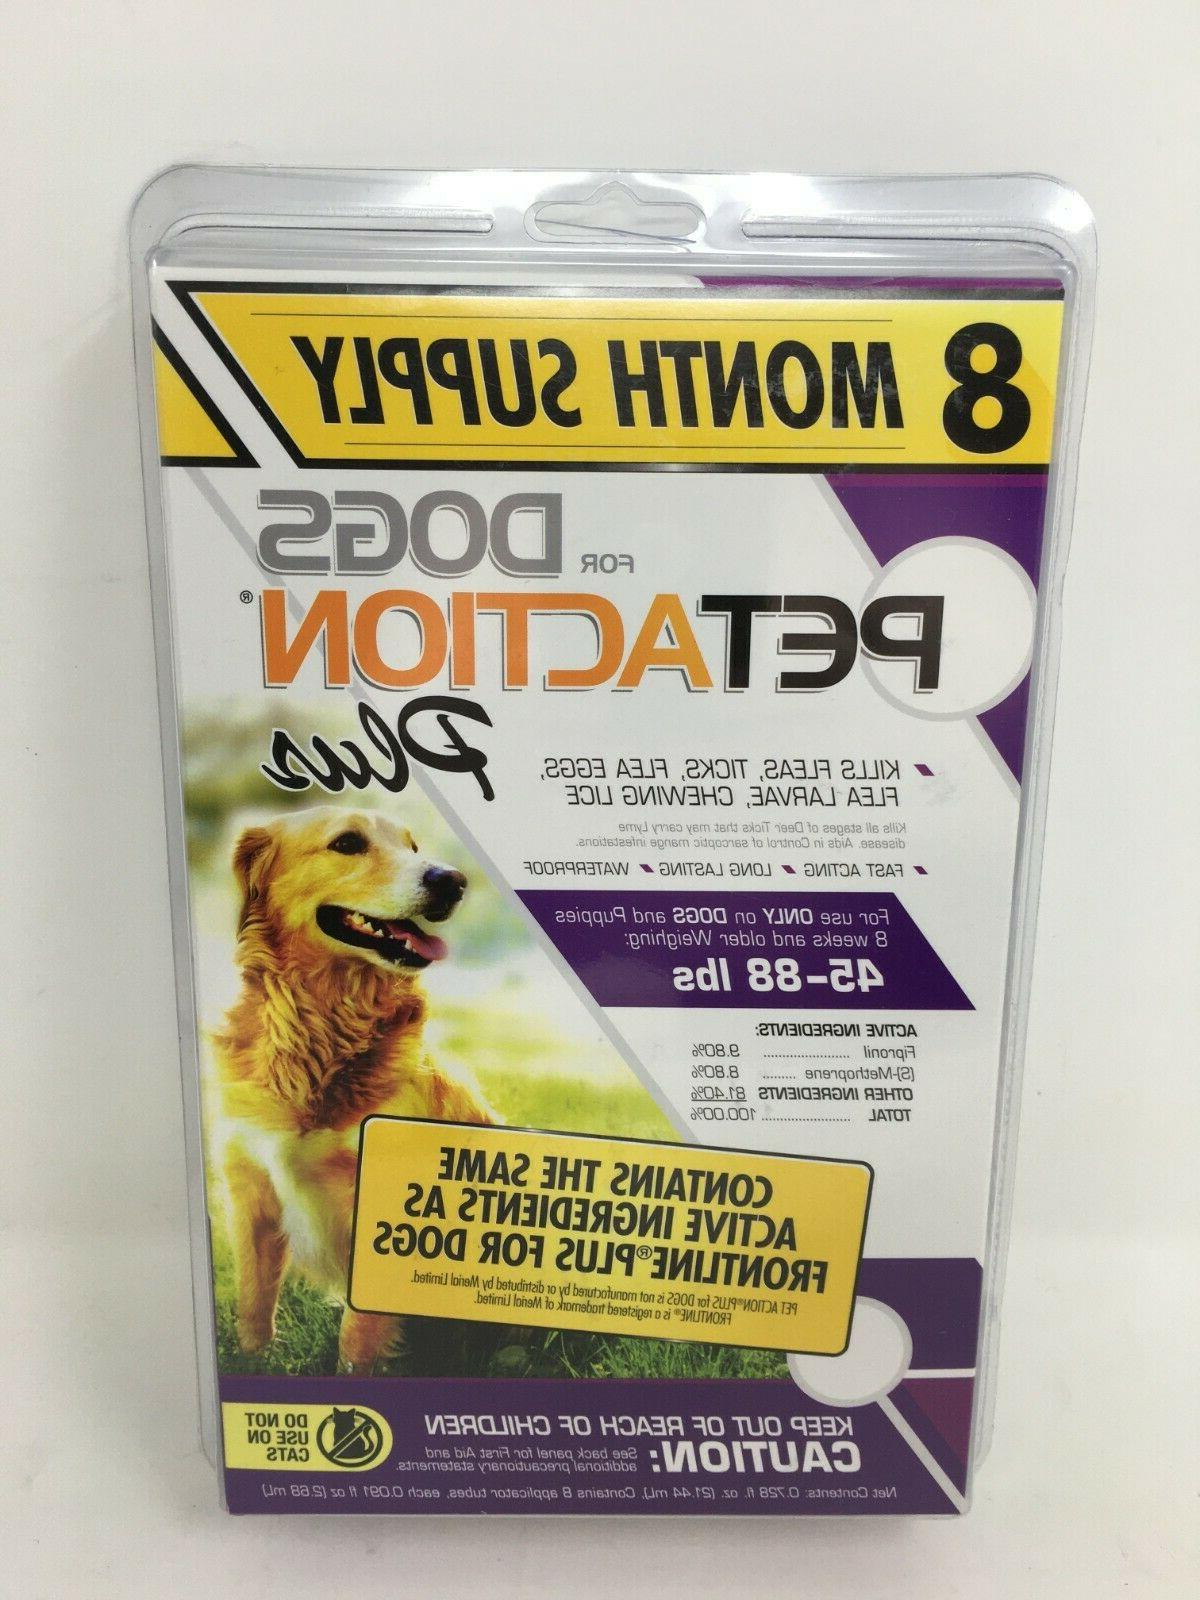 8 month supply plus flea tick